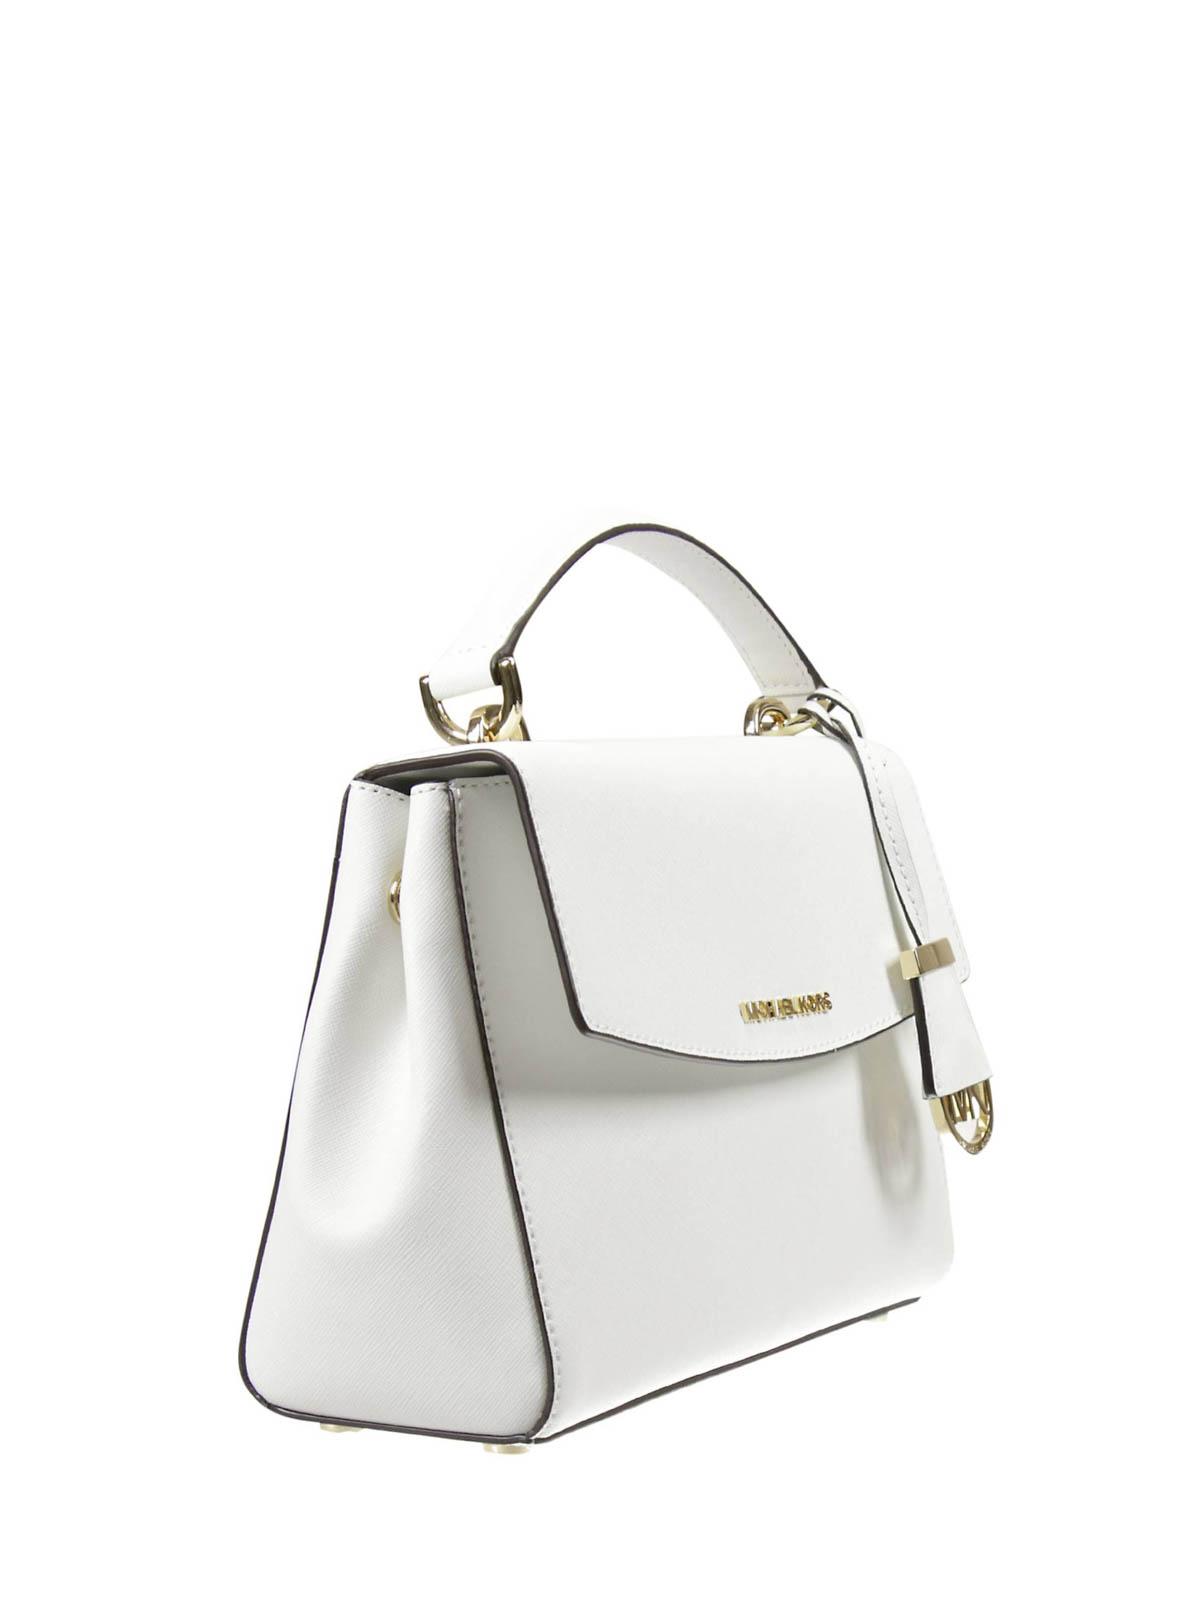 Michael Kors Ava small saffiano satchel cross body bags